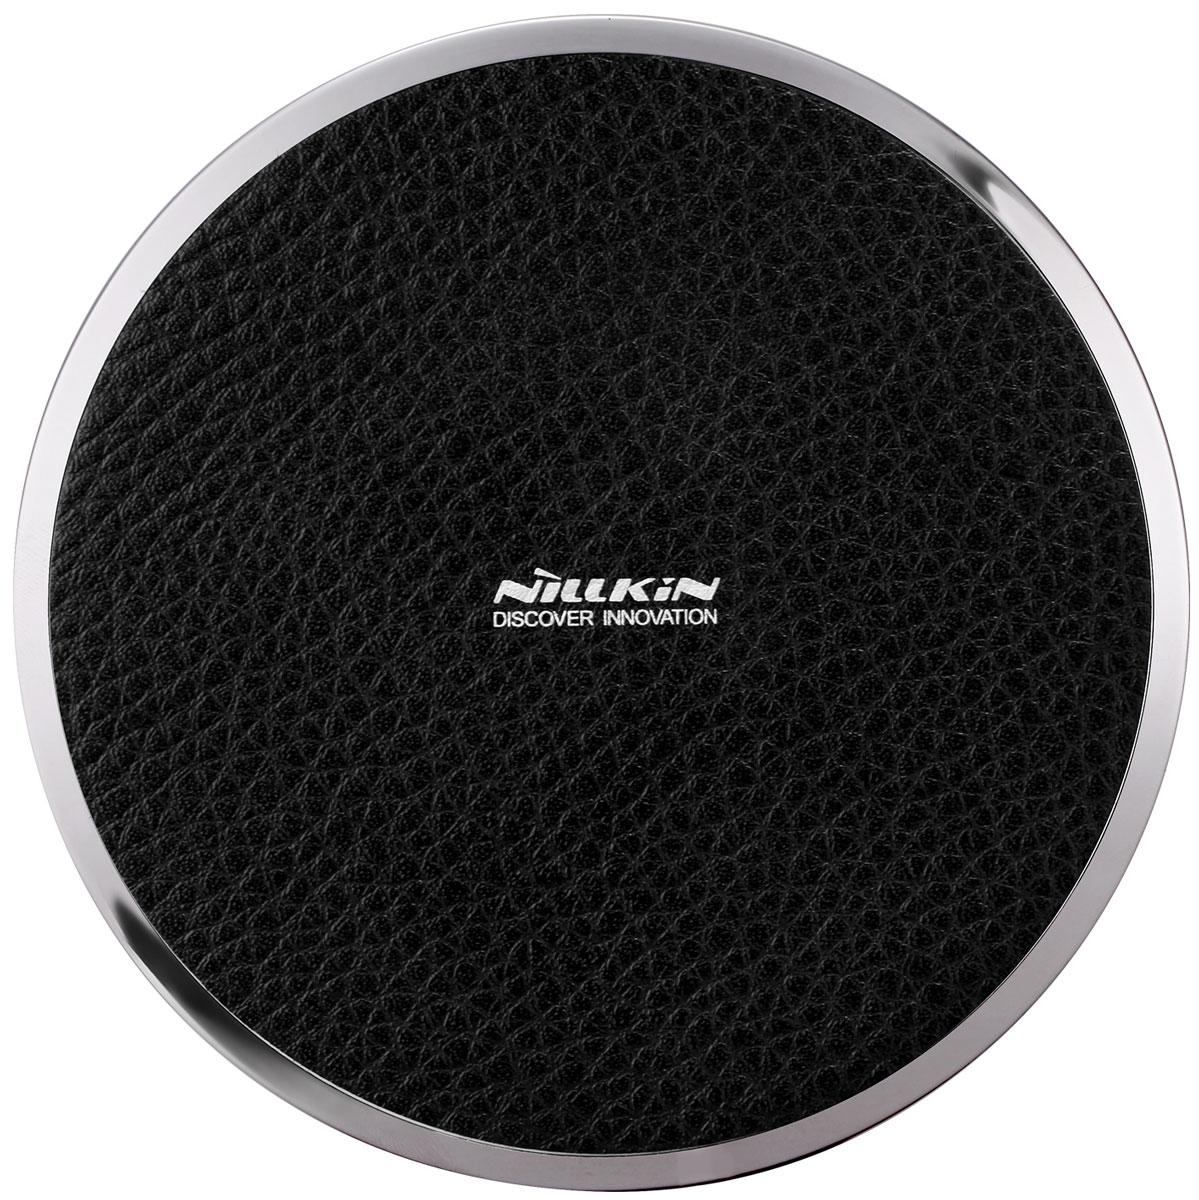 Nillkin Magic Disk III Wireless Charger, Black беспроводное зарядное устройство - Зарядные устройства